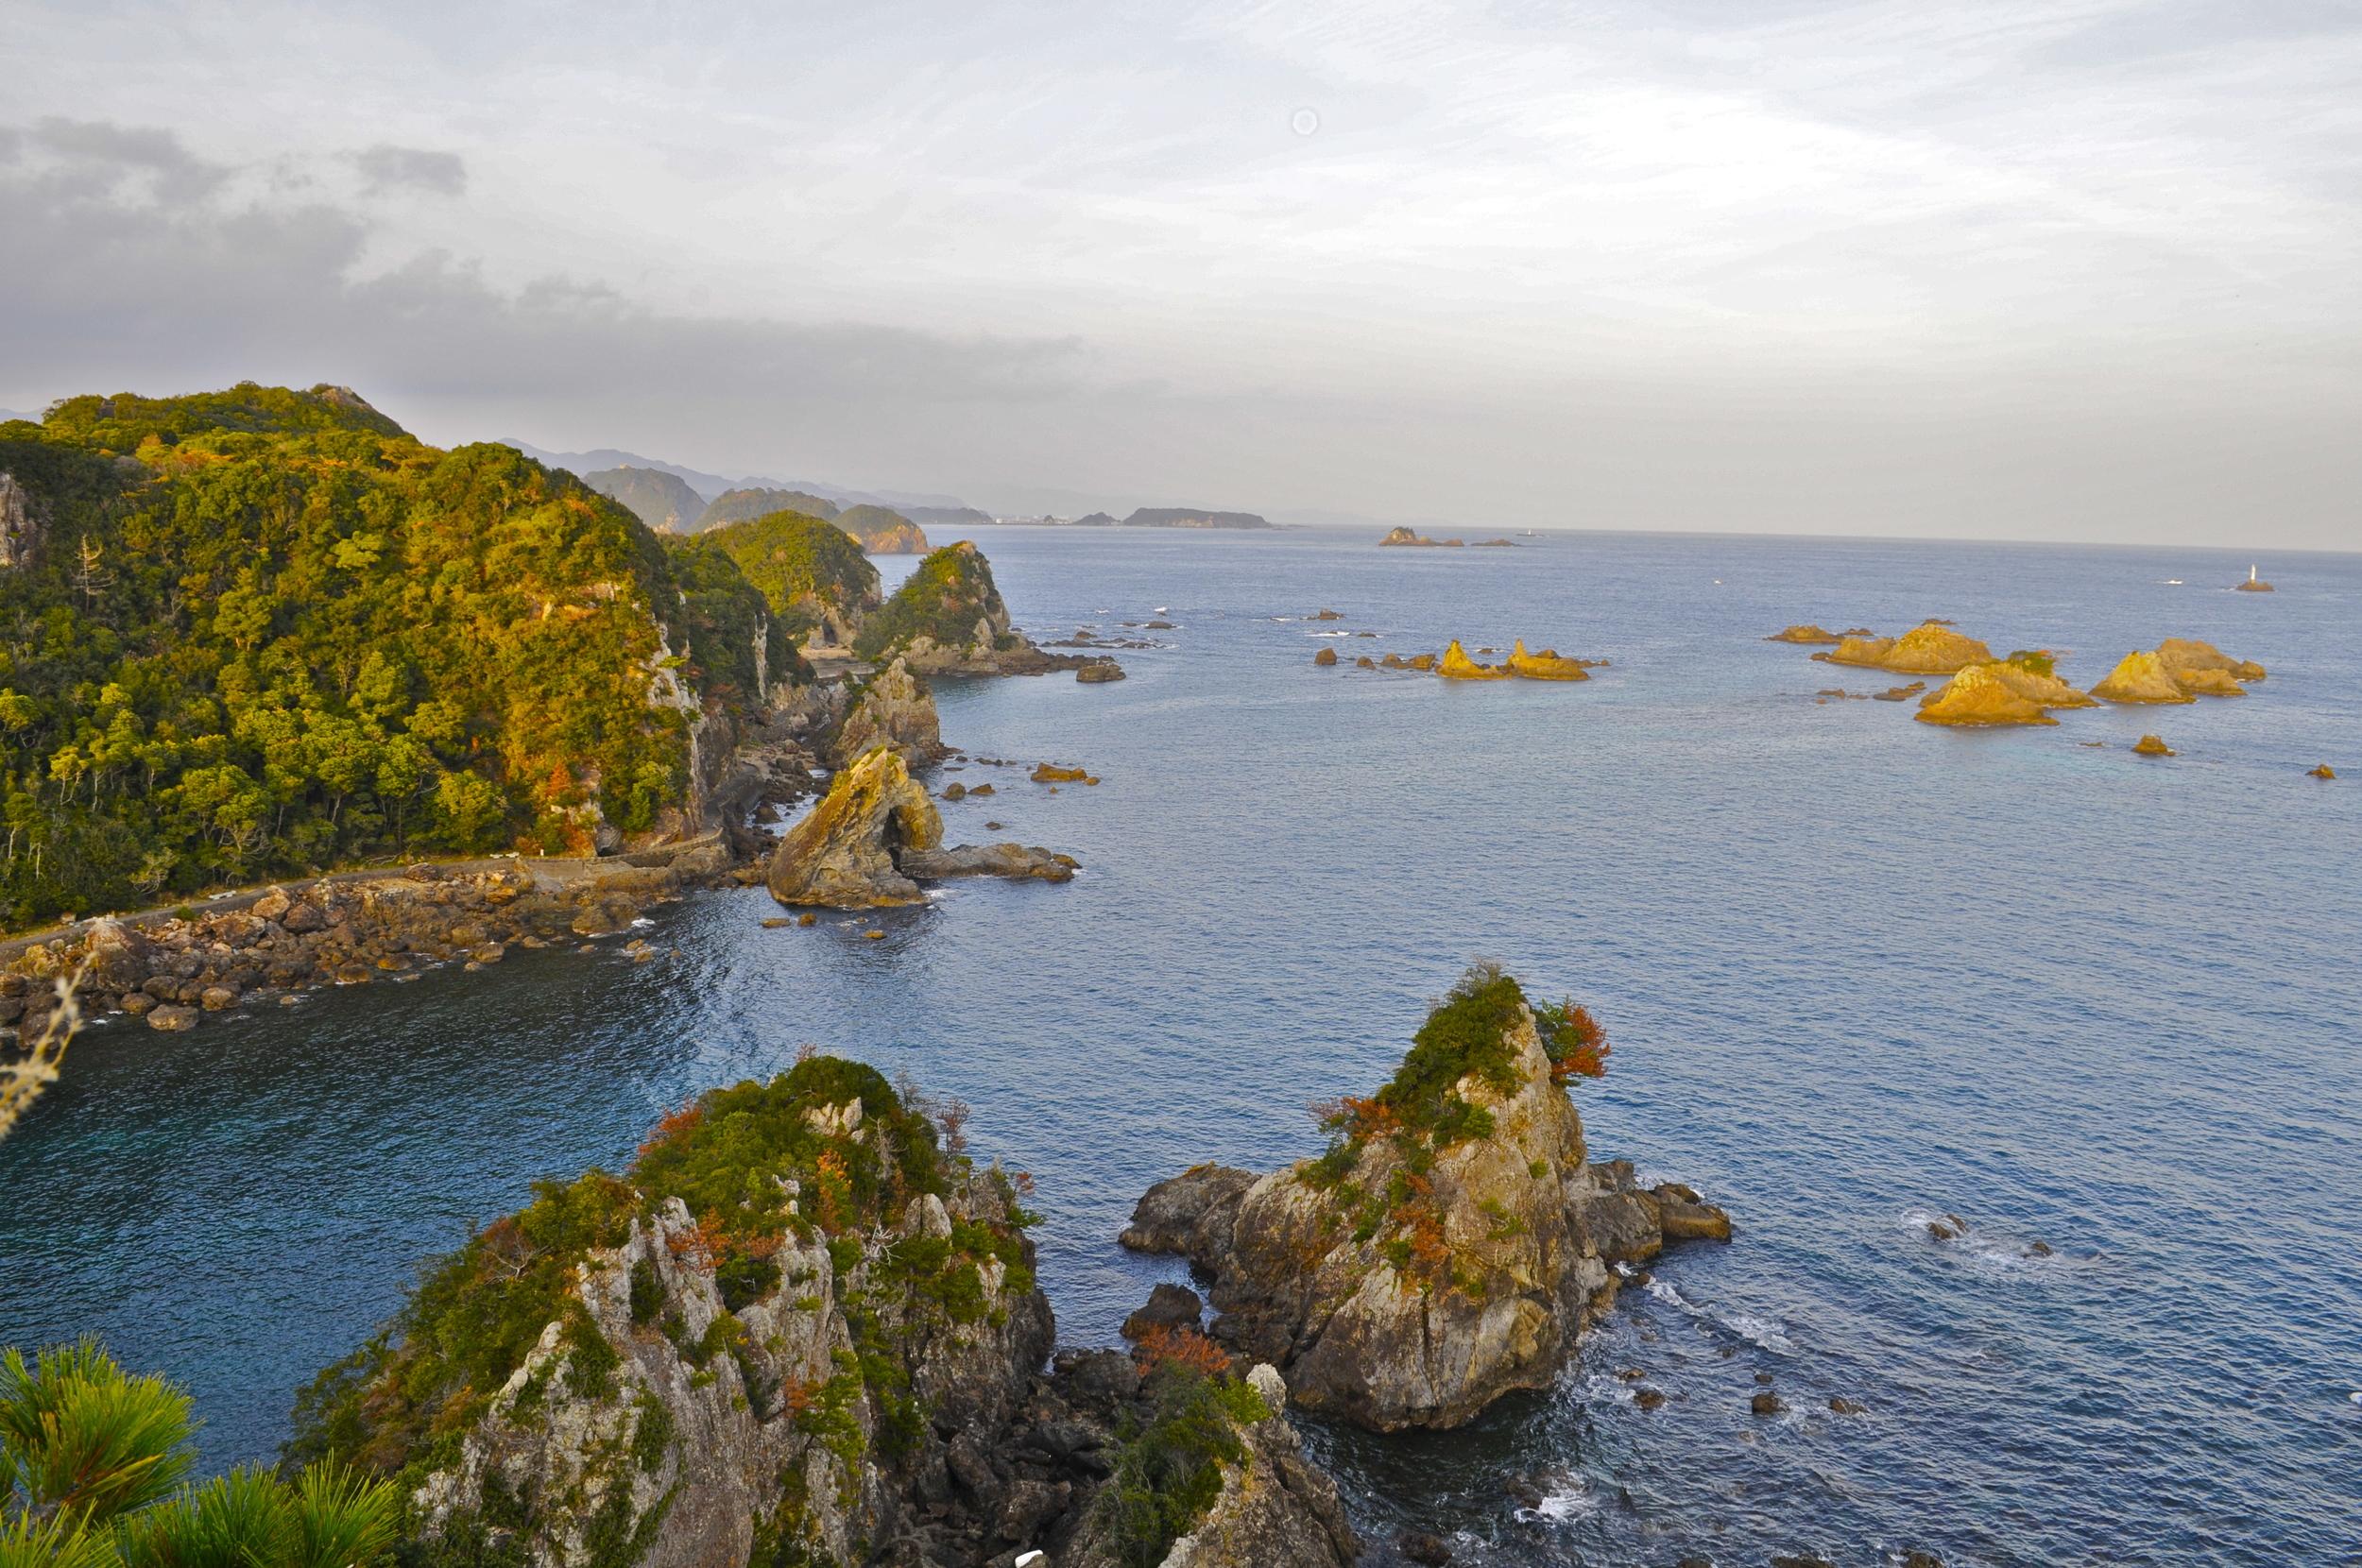 Hatakejiri Bay, also known as 'The Cove', Taiji, Japan.